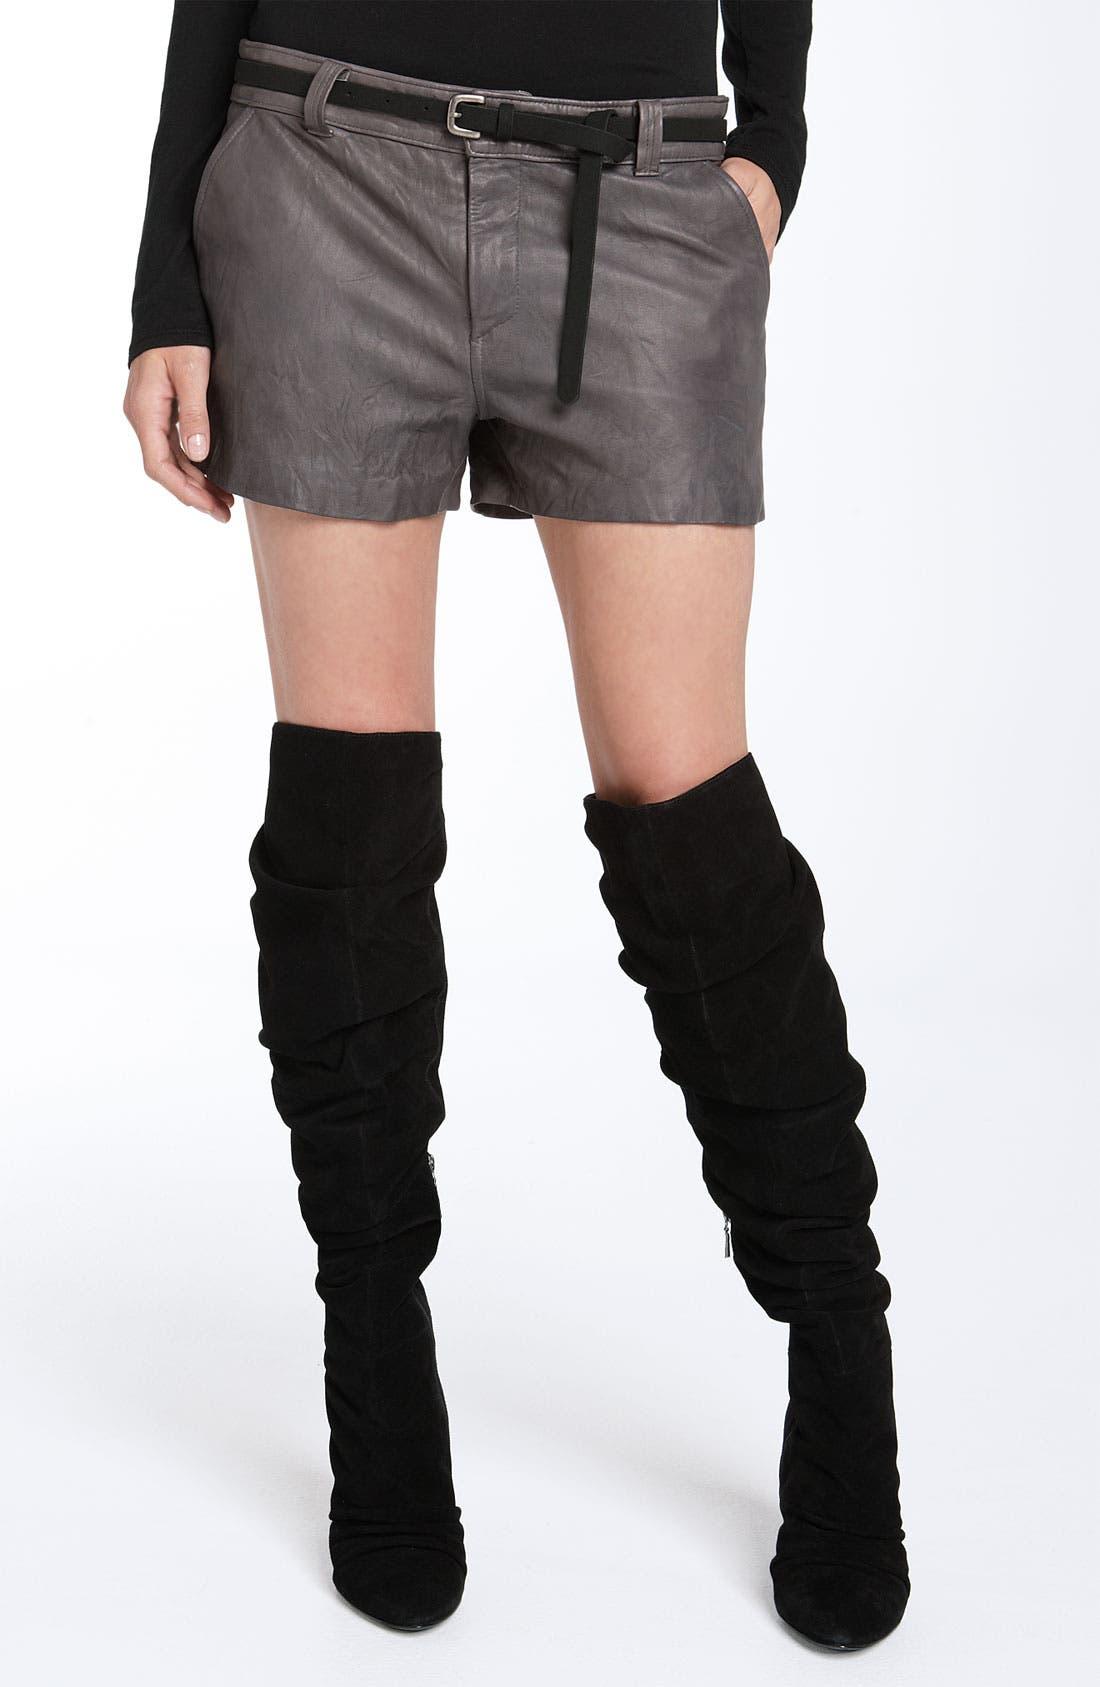 Alternate Image 1 Selected - Joie 'Denver' Leather Shorts